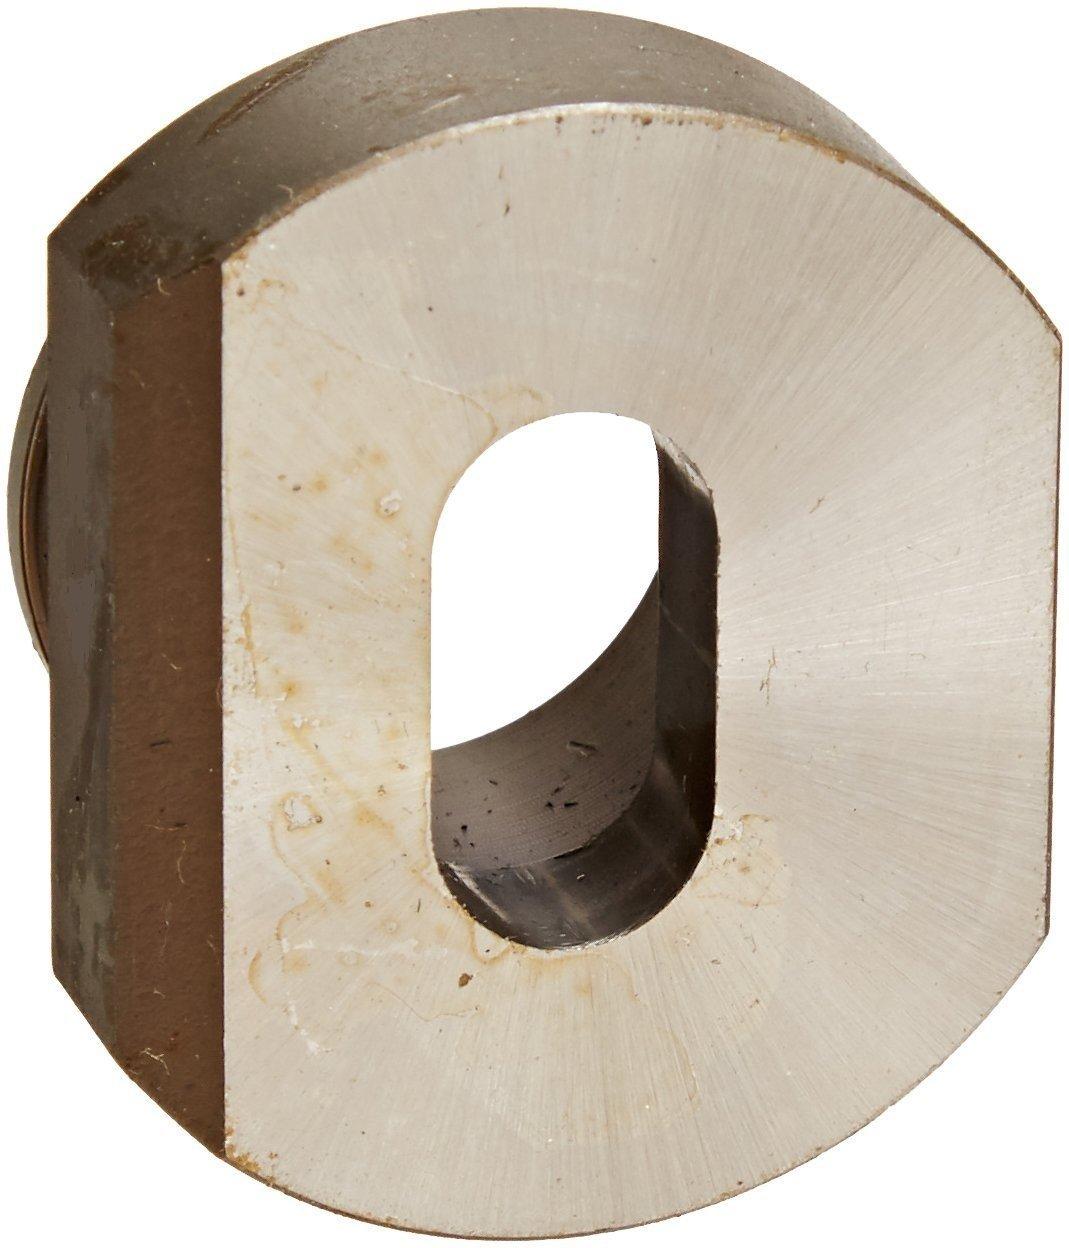 6.5 mm Size Nitto Kohki USA NIT TK00194-0 Nitto Kohki TK00194-0 Punch for E55-0619 Handy Selfer Electric Punch